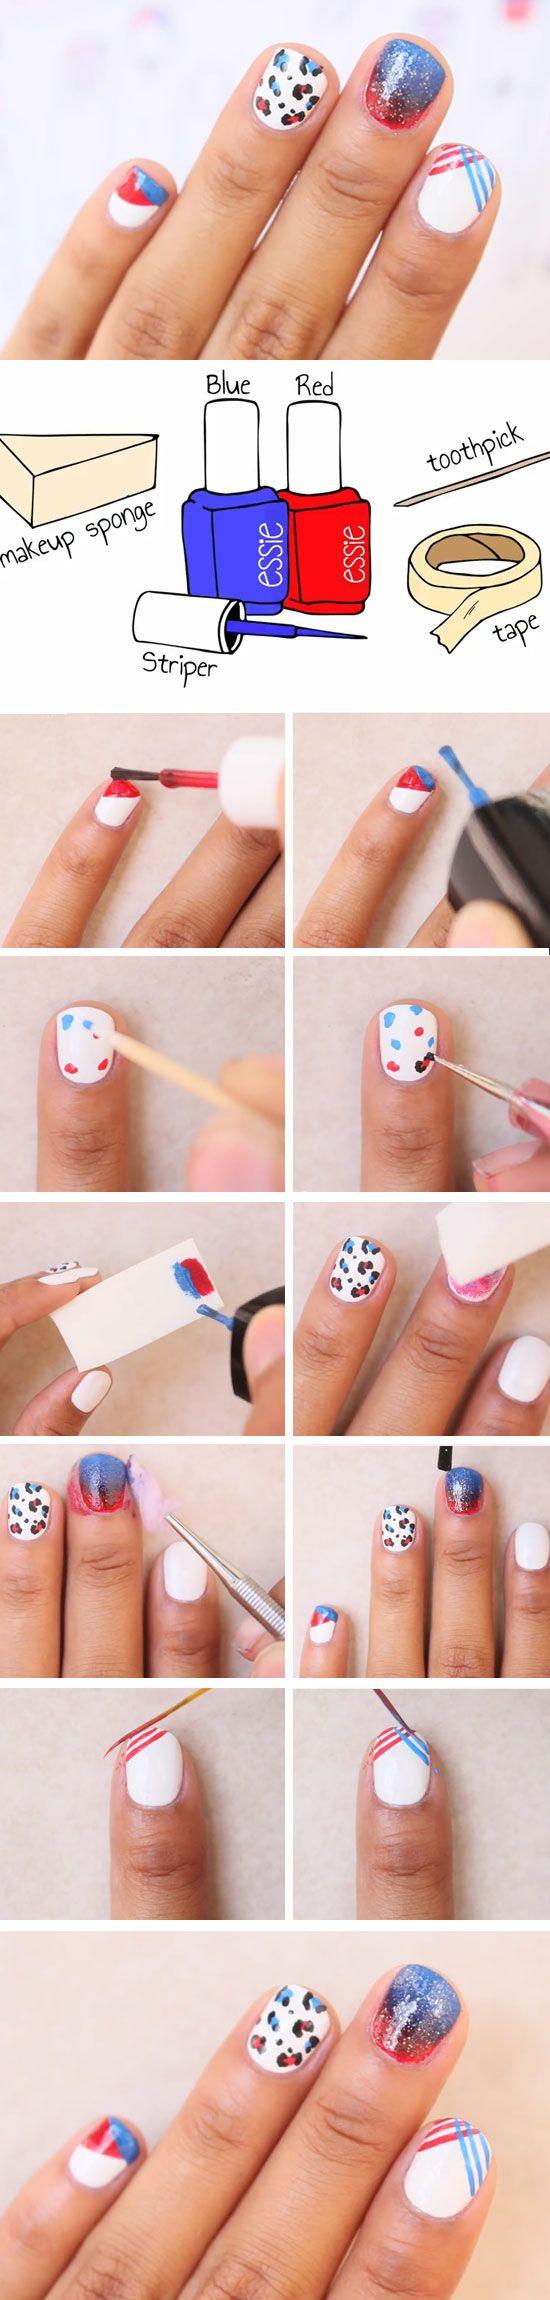 Leopard spots patriotic nail designs red white blue nails